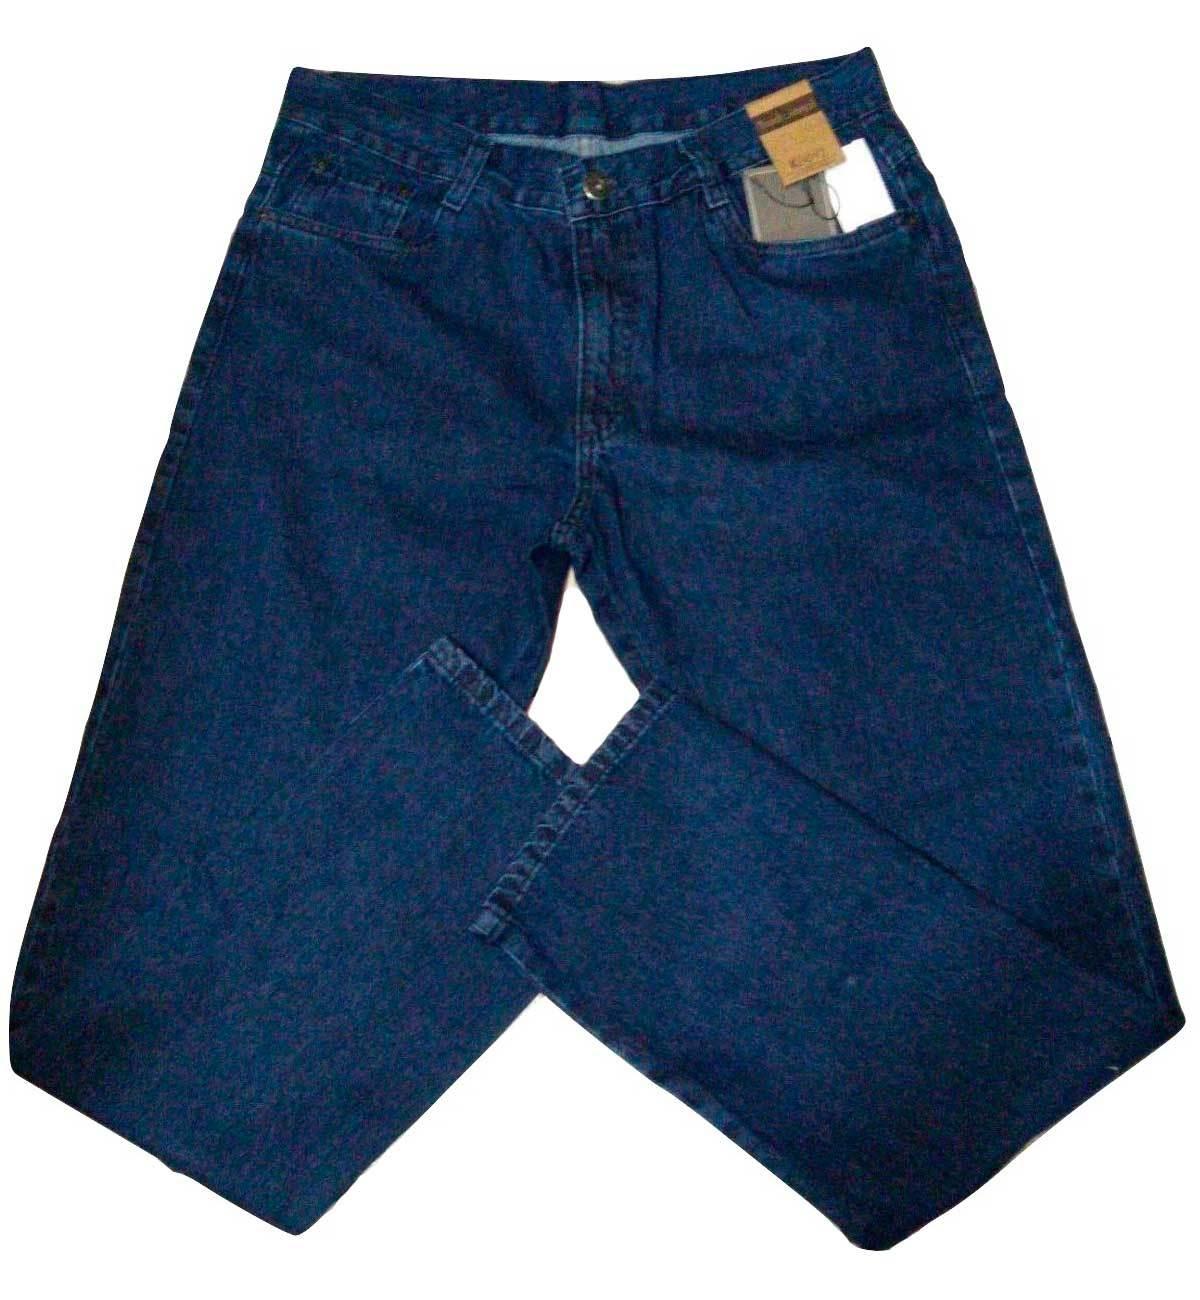 Calça masculina jeans corte reto tradicional